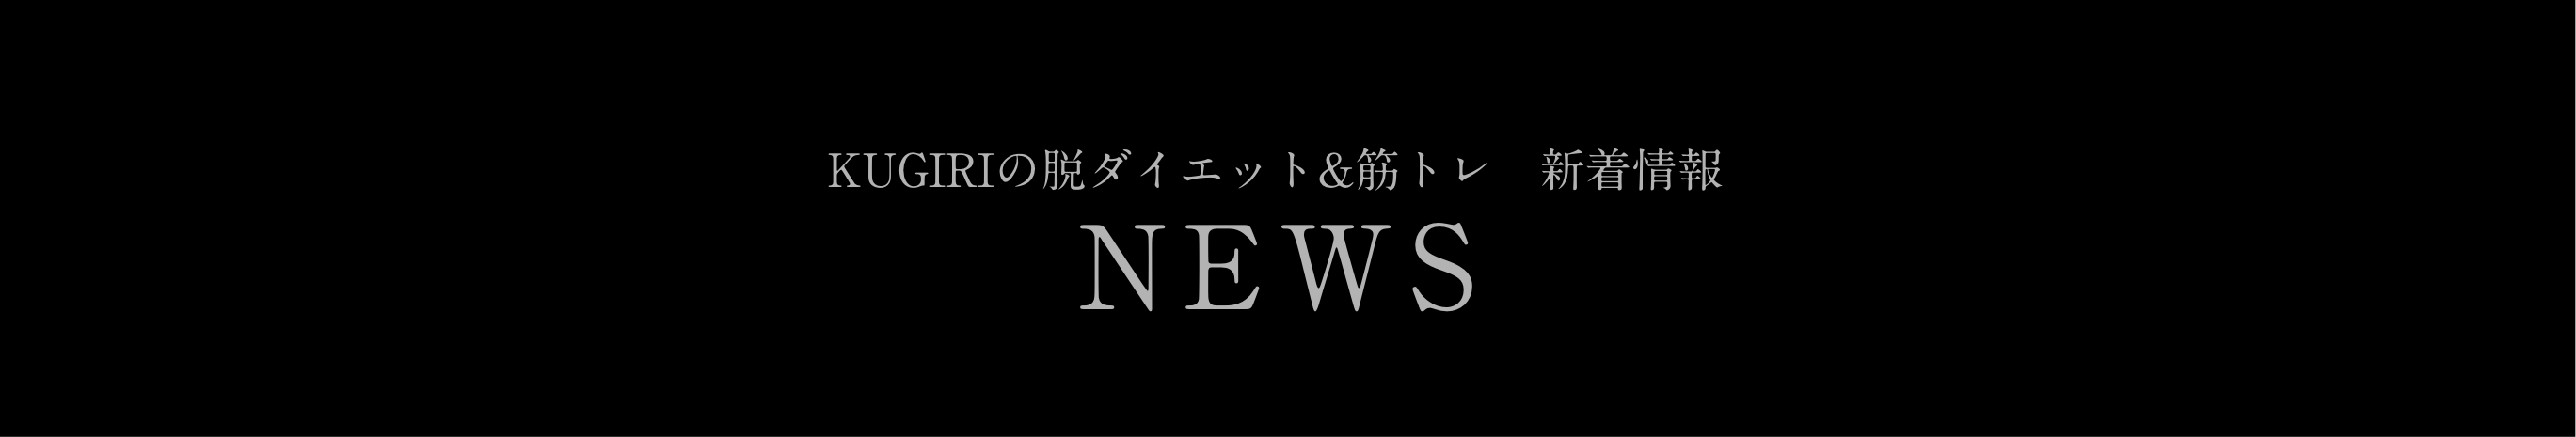 KUGIRIの脱ダイエット&筋トレ 新着情報 NEWS